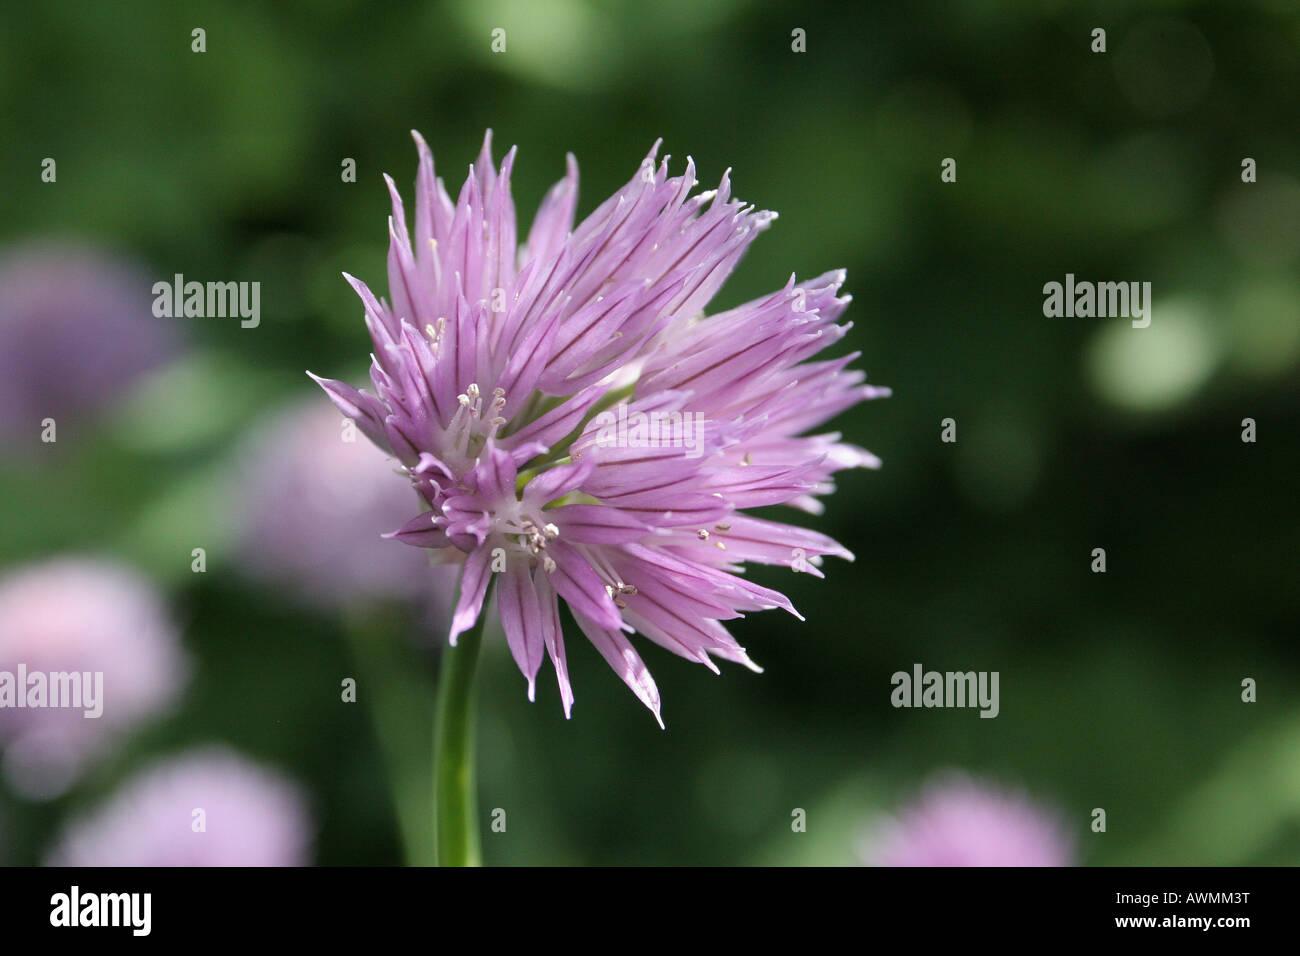 Chives (Allium schoenoprasum), purple flower Stock Photo